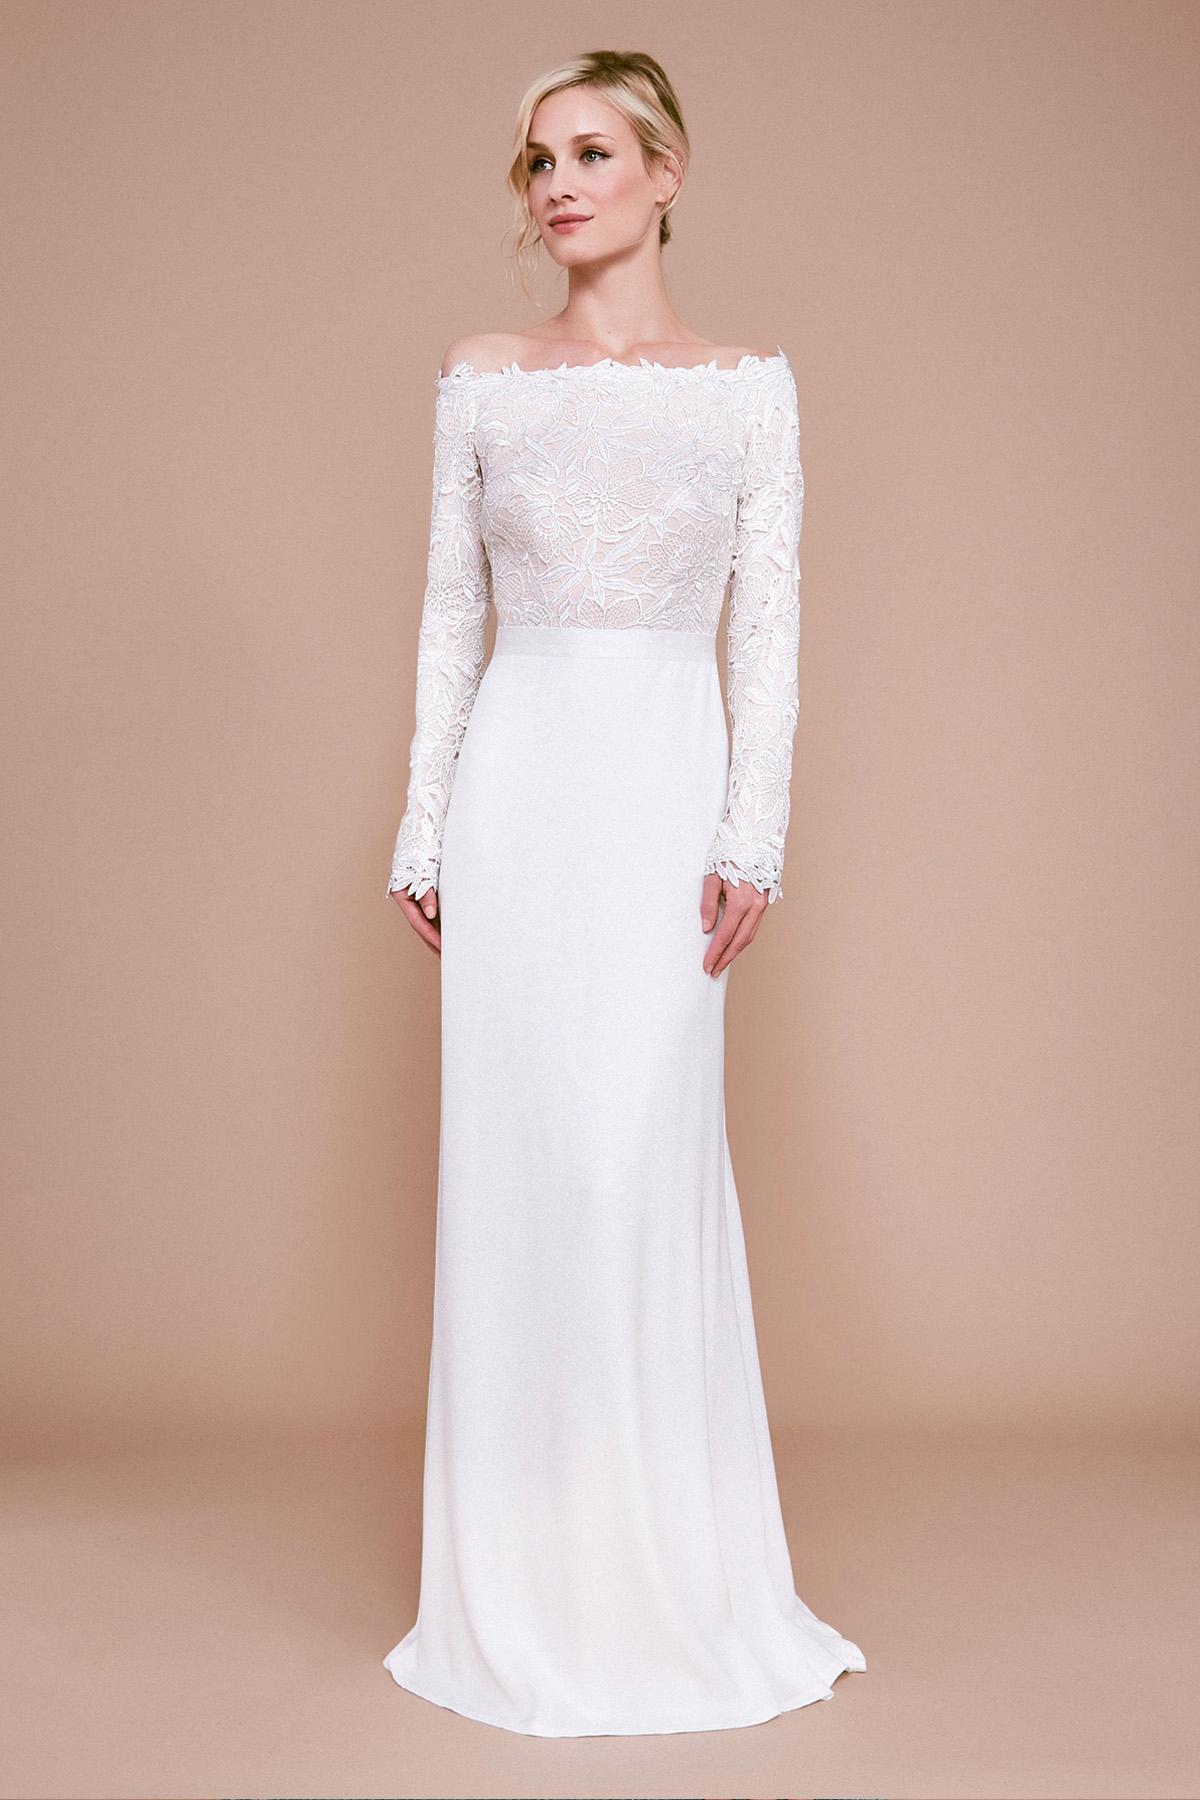 646c687f9d97e Tadashi Shoji Kizer Off-the-shoulder Lace Crepe Gown in White - Lyst